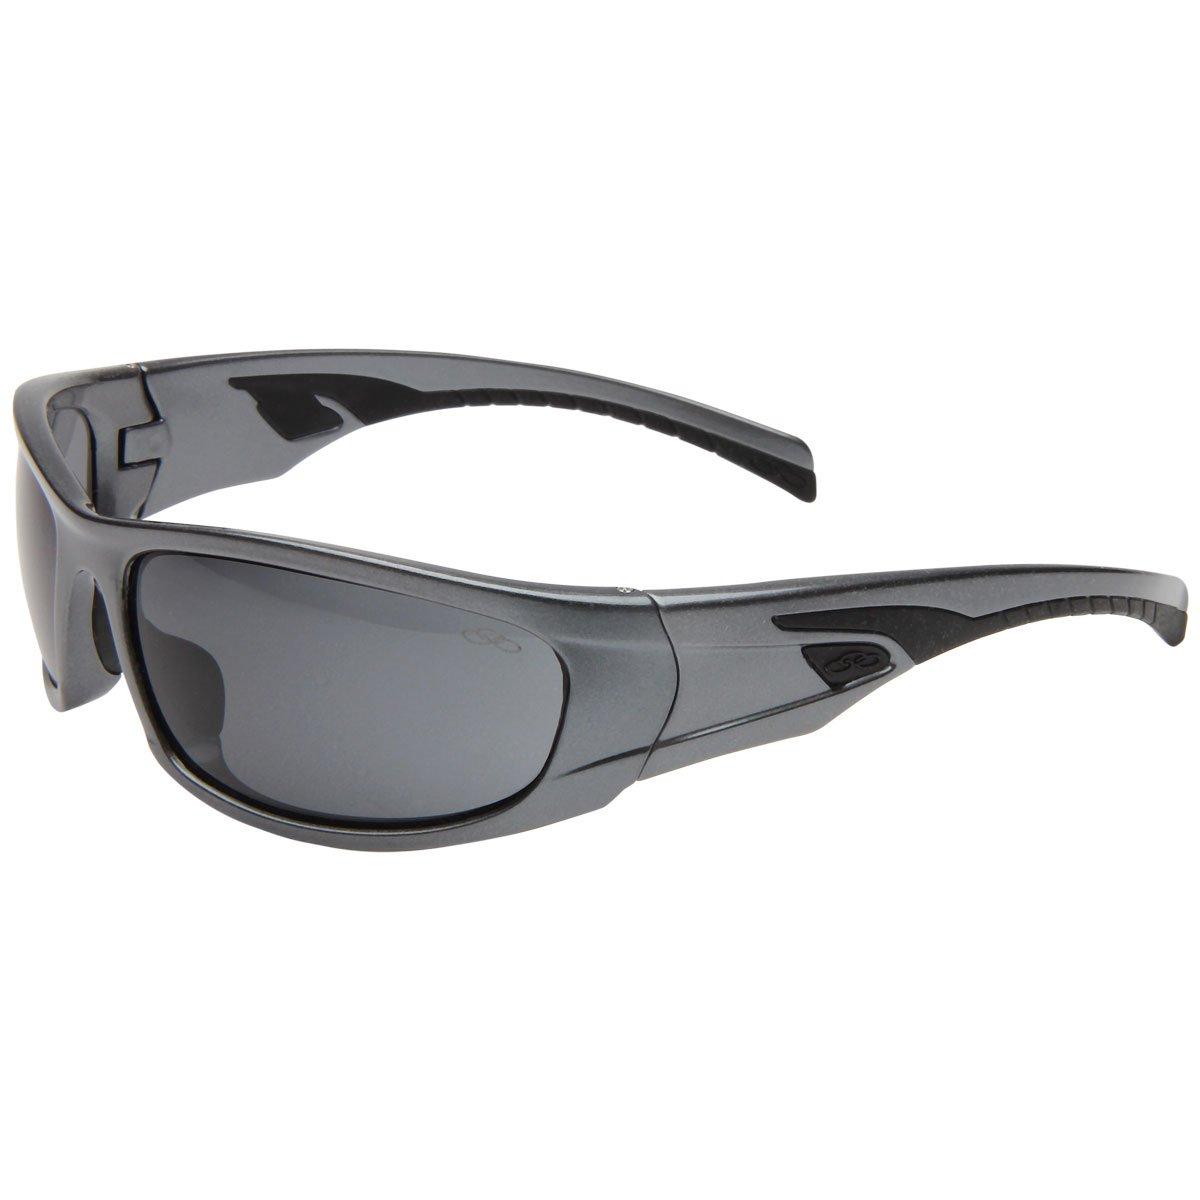 0cfba003eb288 Óculos Olympikus Roma - Compre Agora   Netshoes